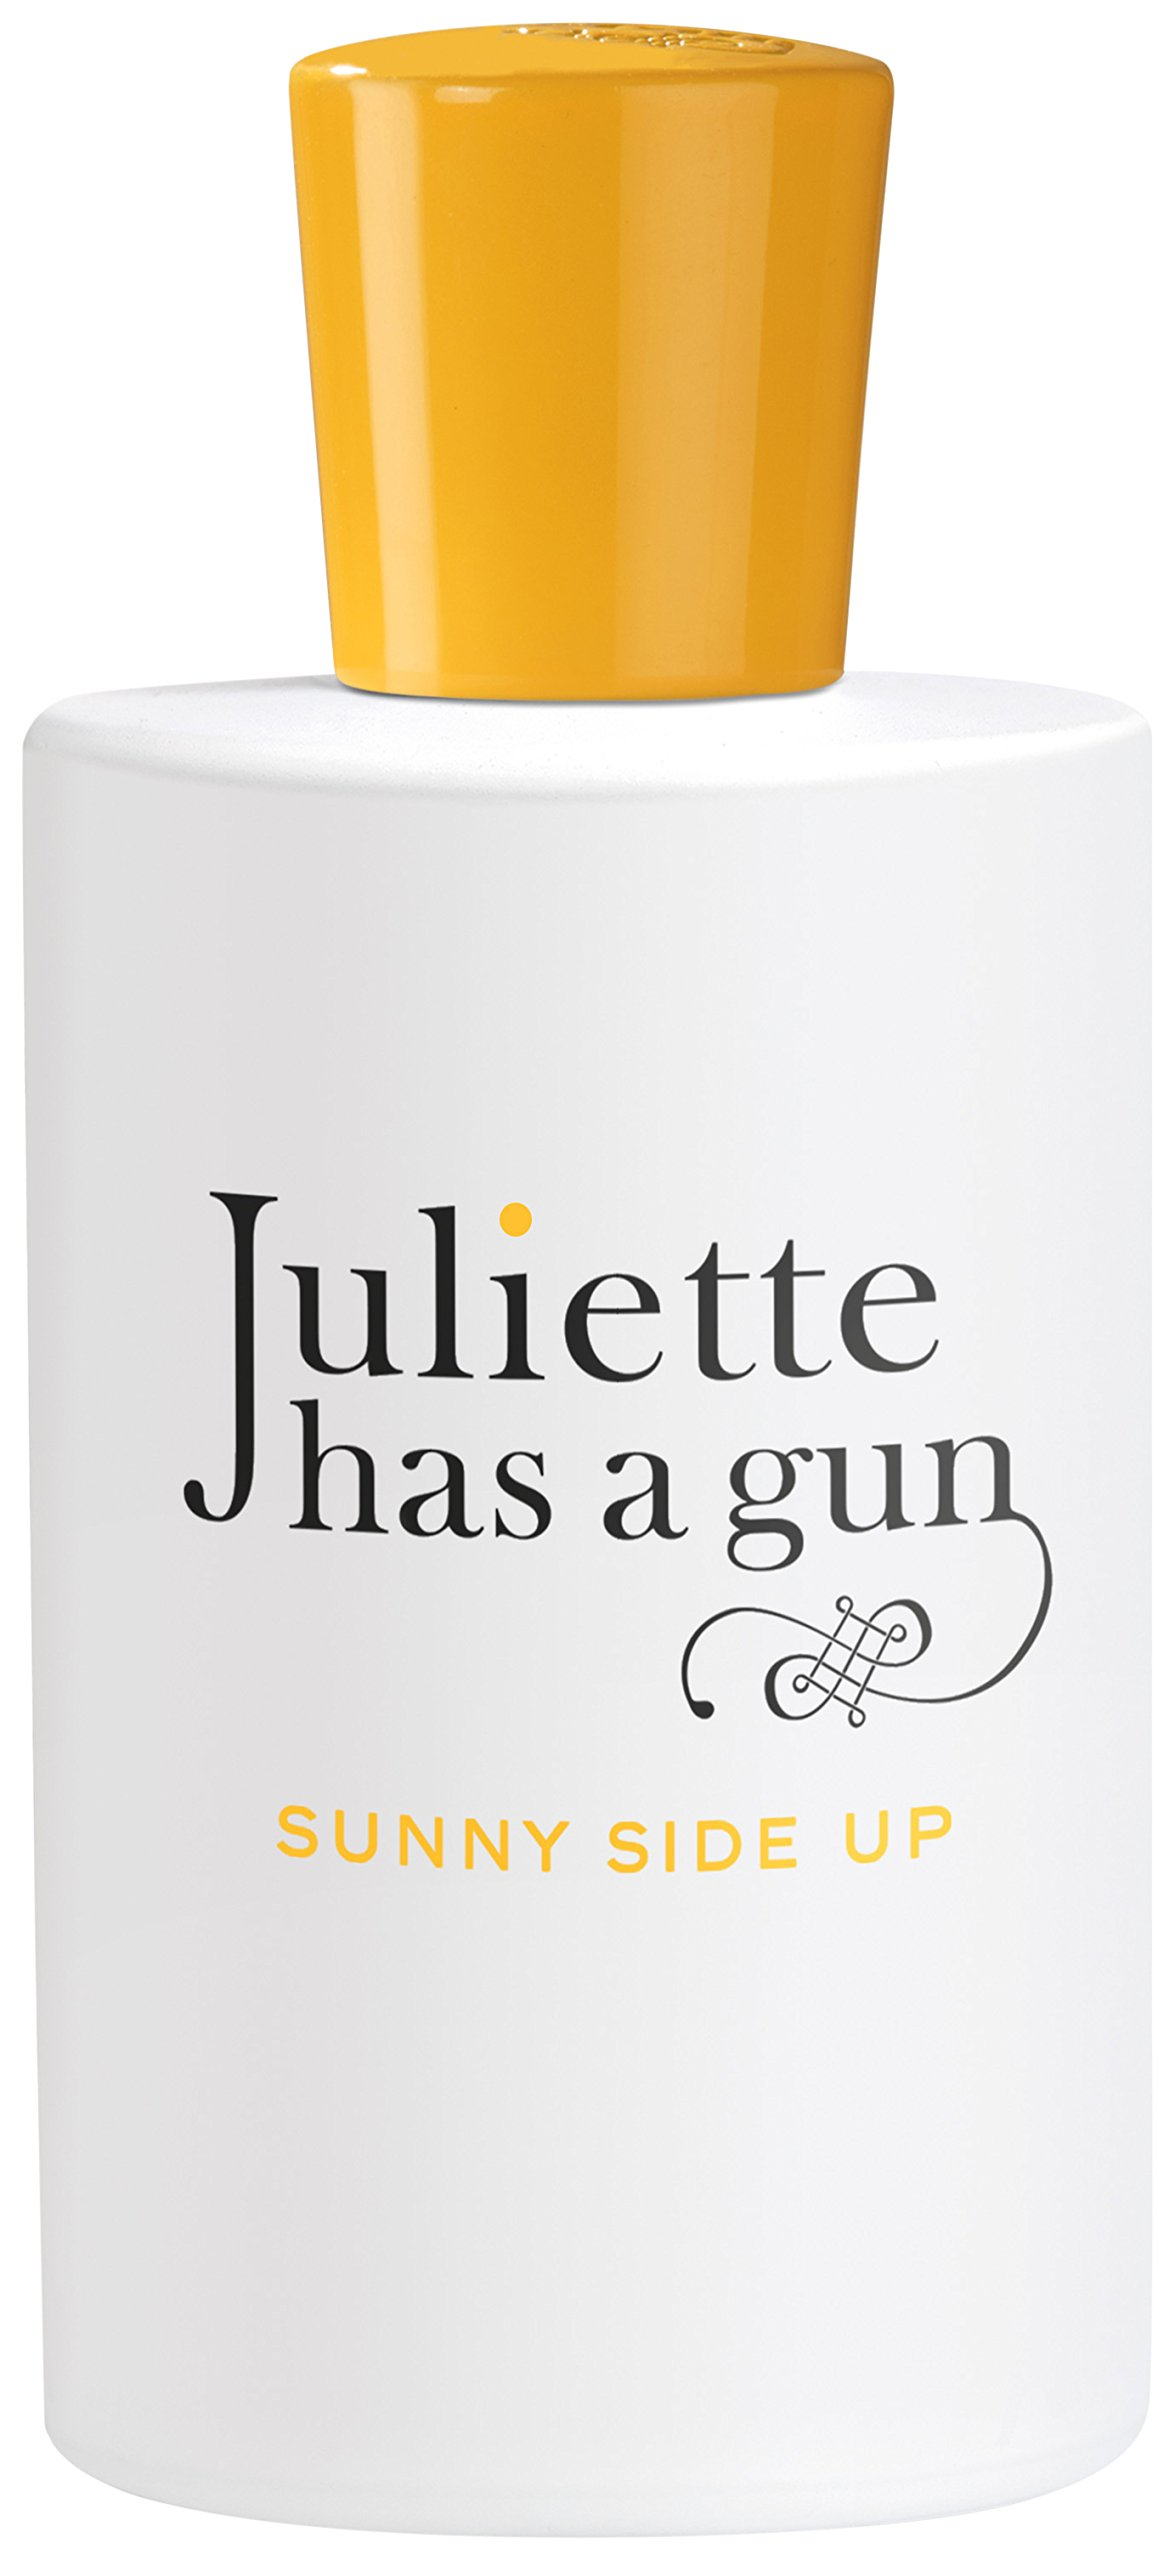 Juliette Has A Gun Sunny Side Up Eau de Parfum Spray, 3.3 fl. oz.